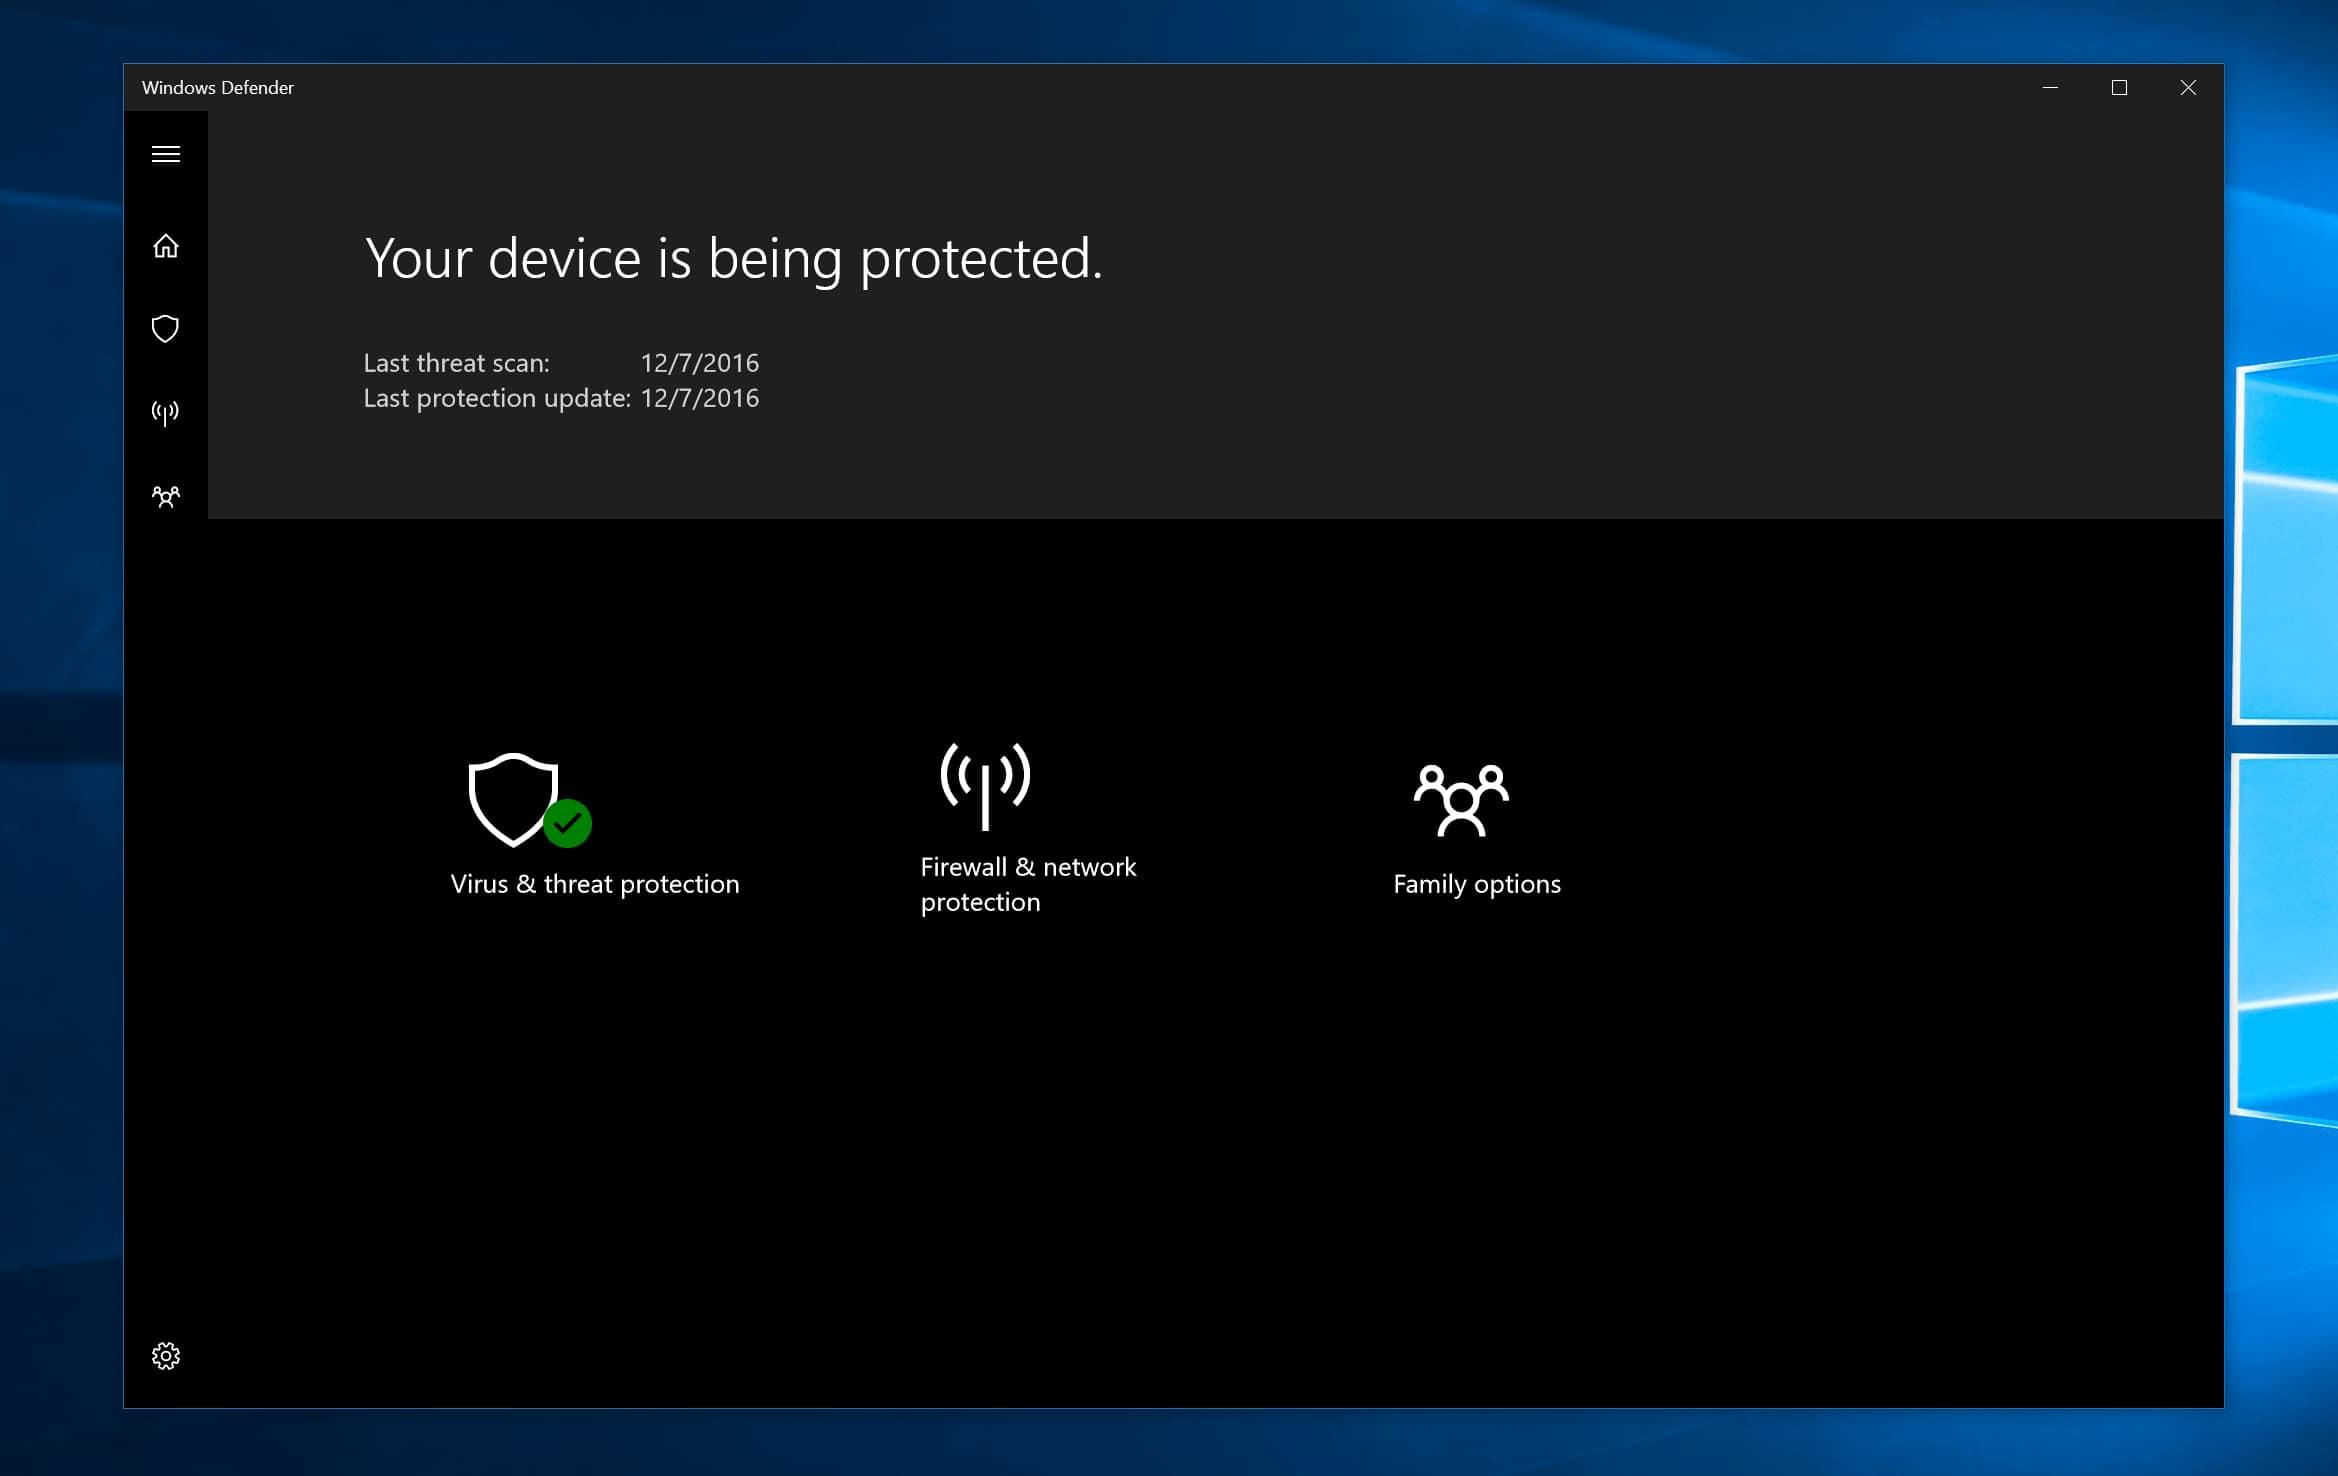 Windows Defender在Windows 10上可能会被改名